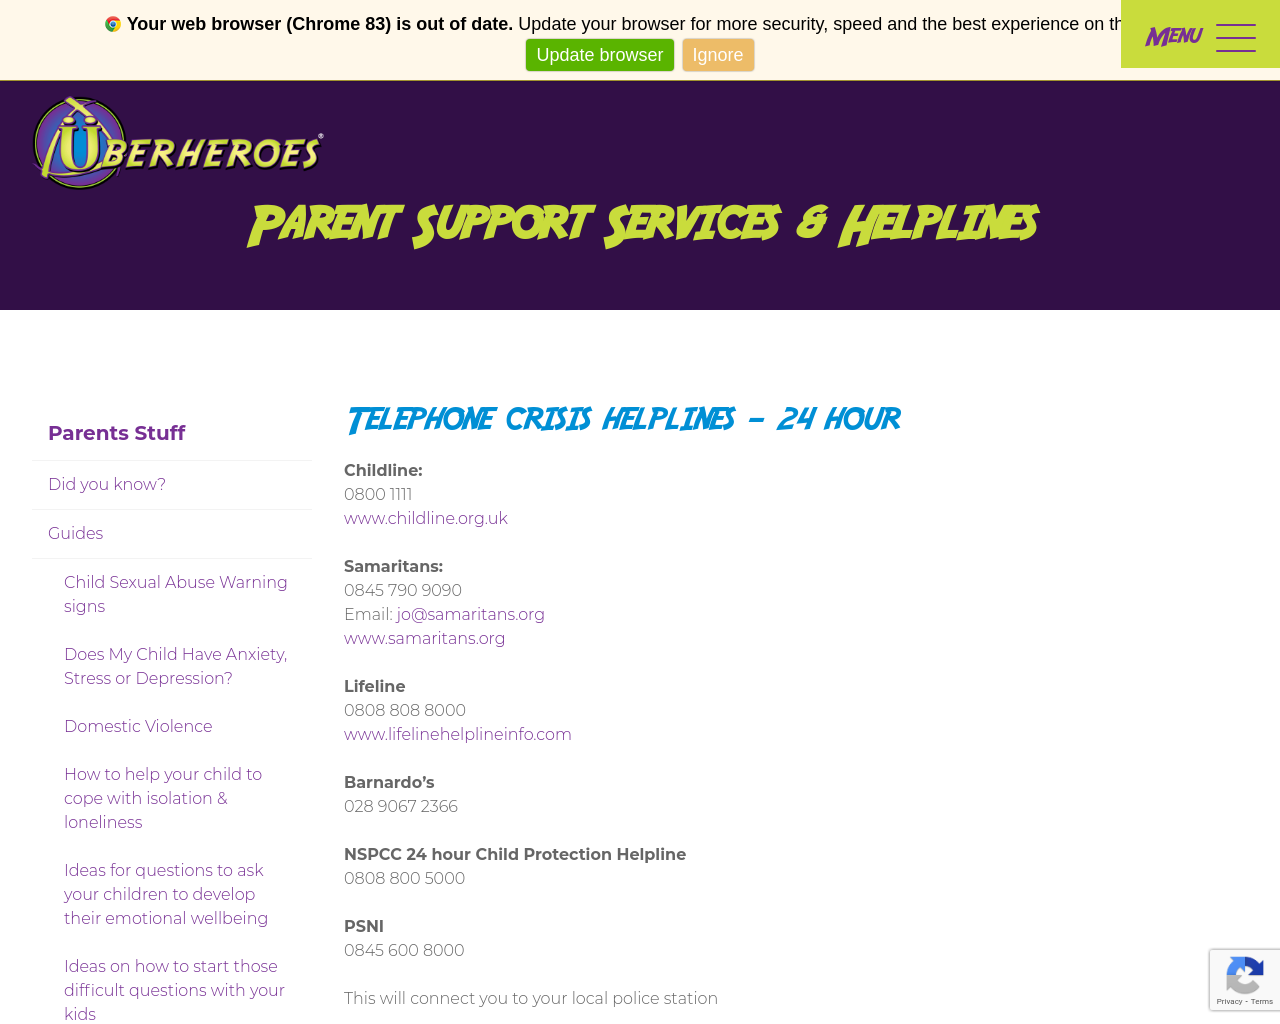 Parent Support Services & Helplines